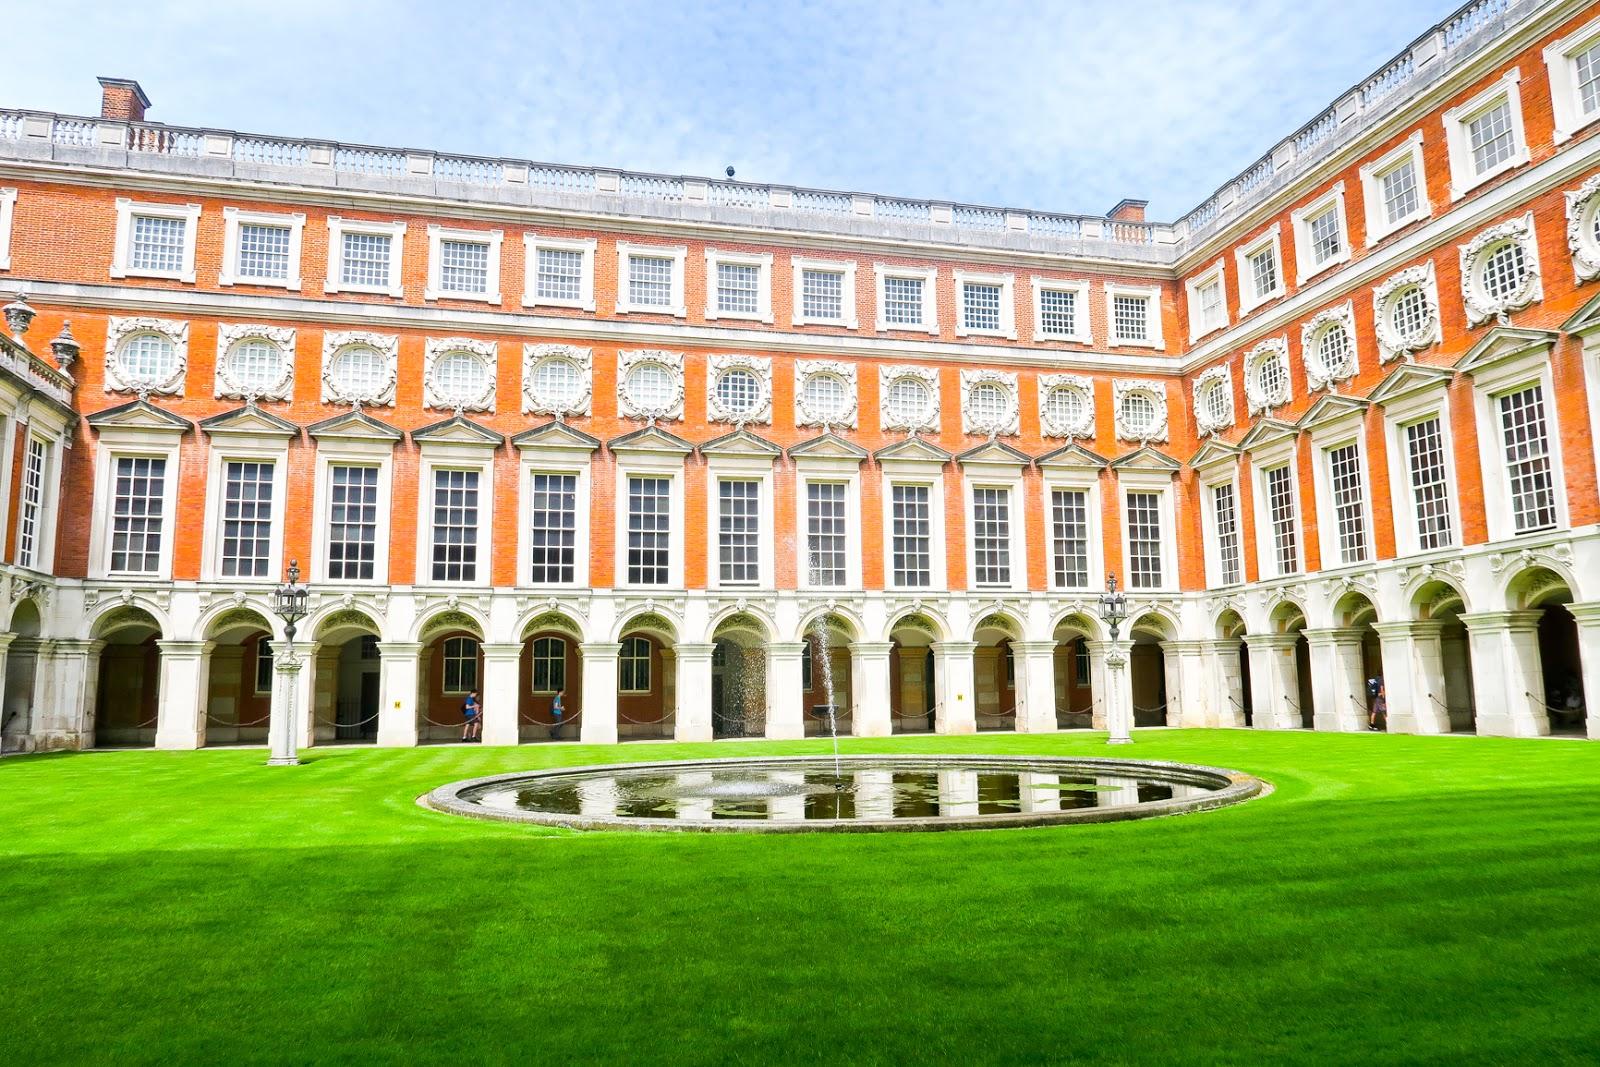 Hampton Court Palace, Hampton Court, King Henry VIII, Henry VIII, Henry Tudor, The Tudors, Tudor Palace